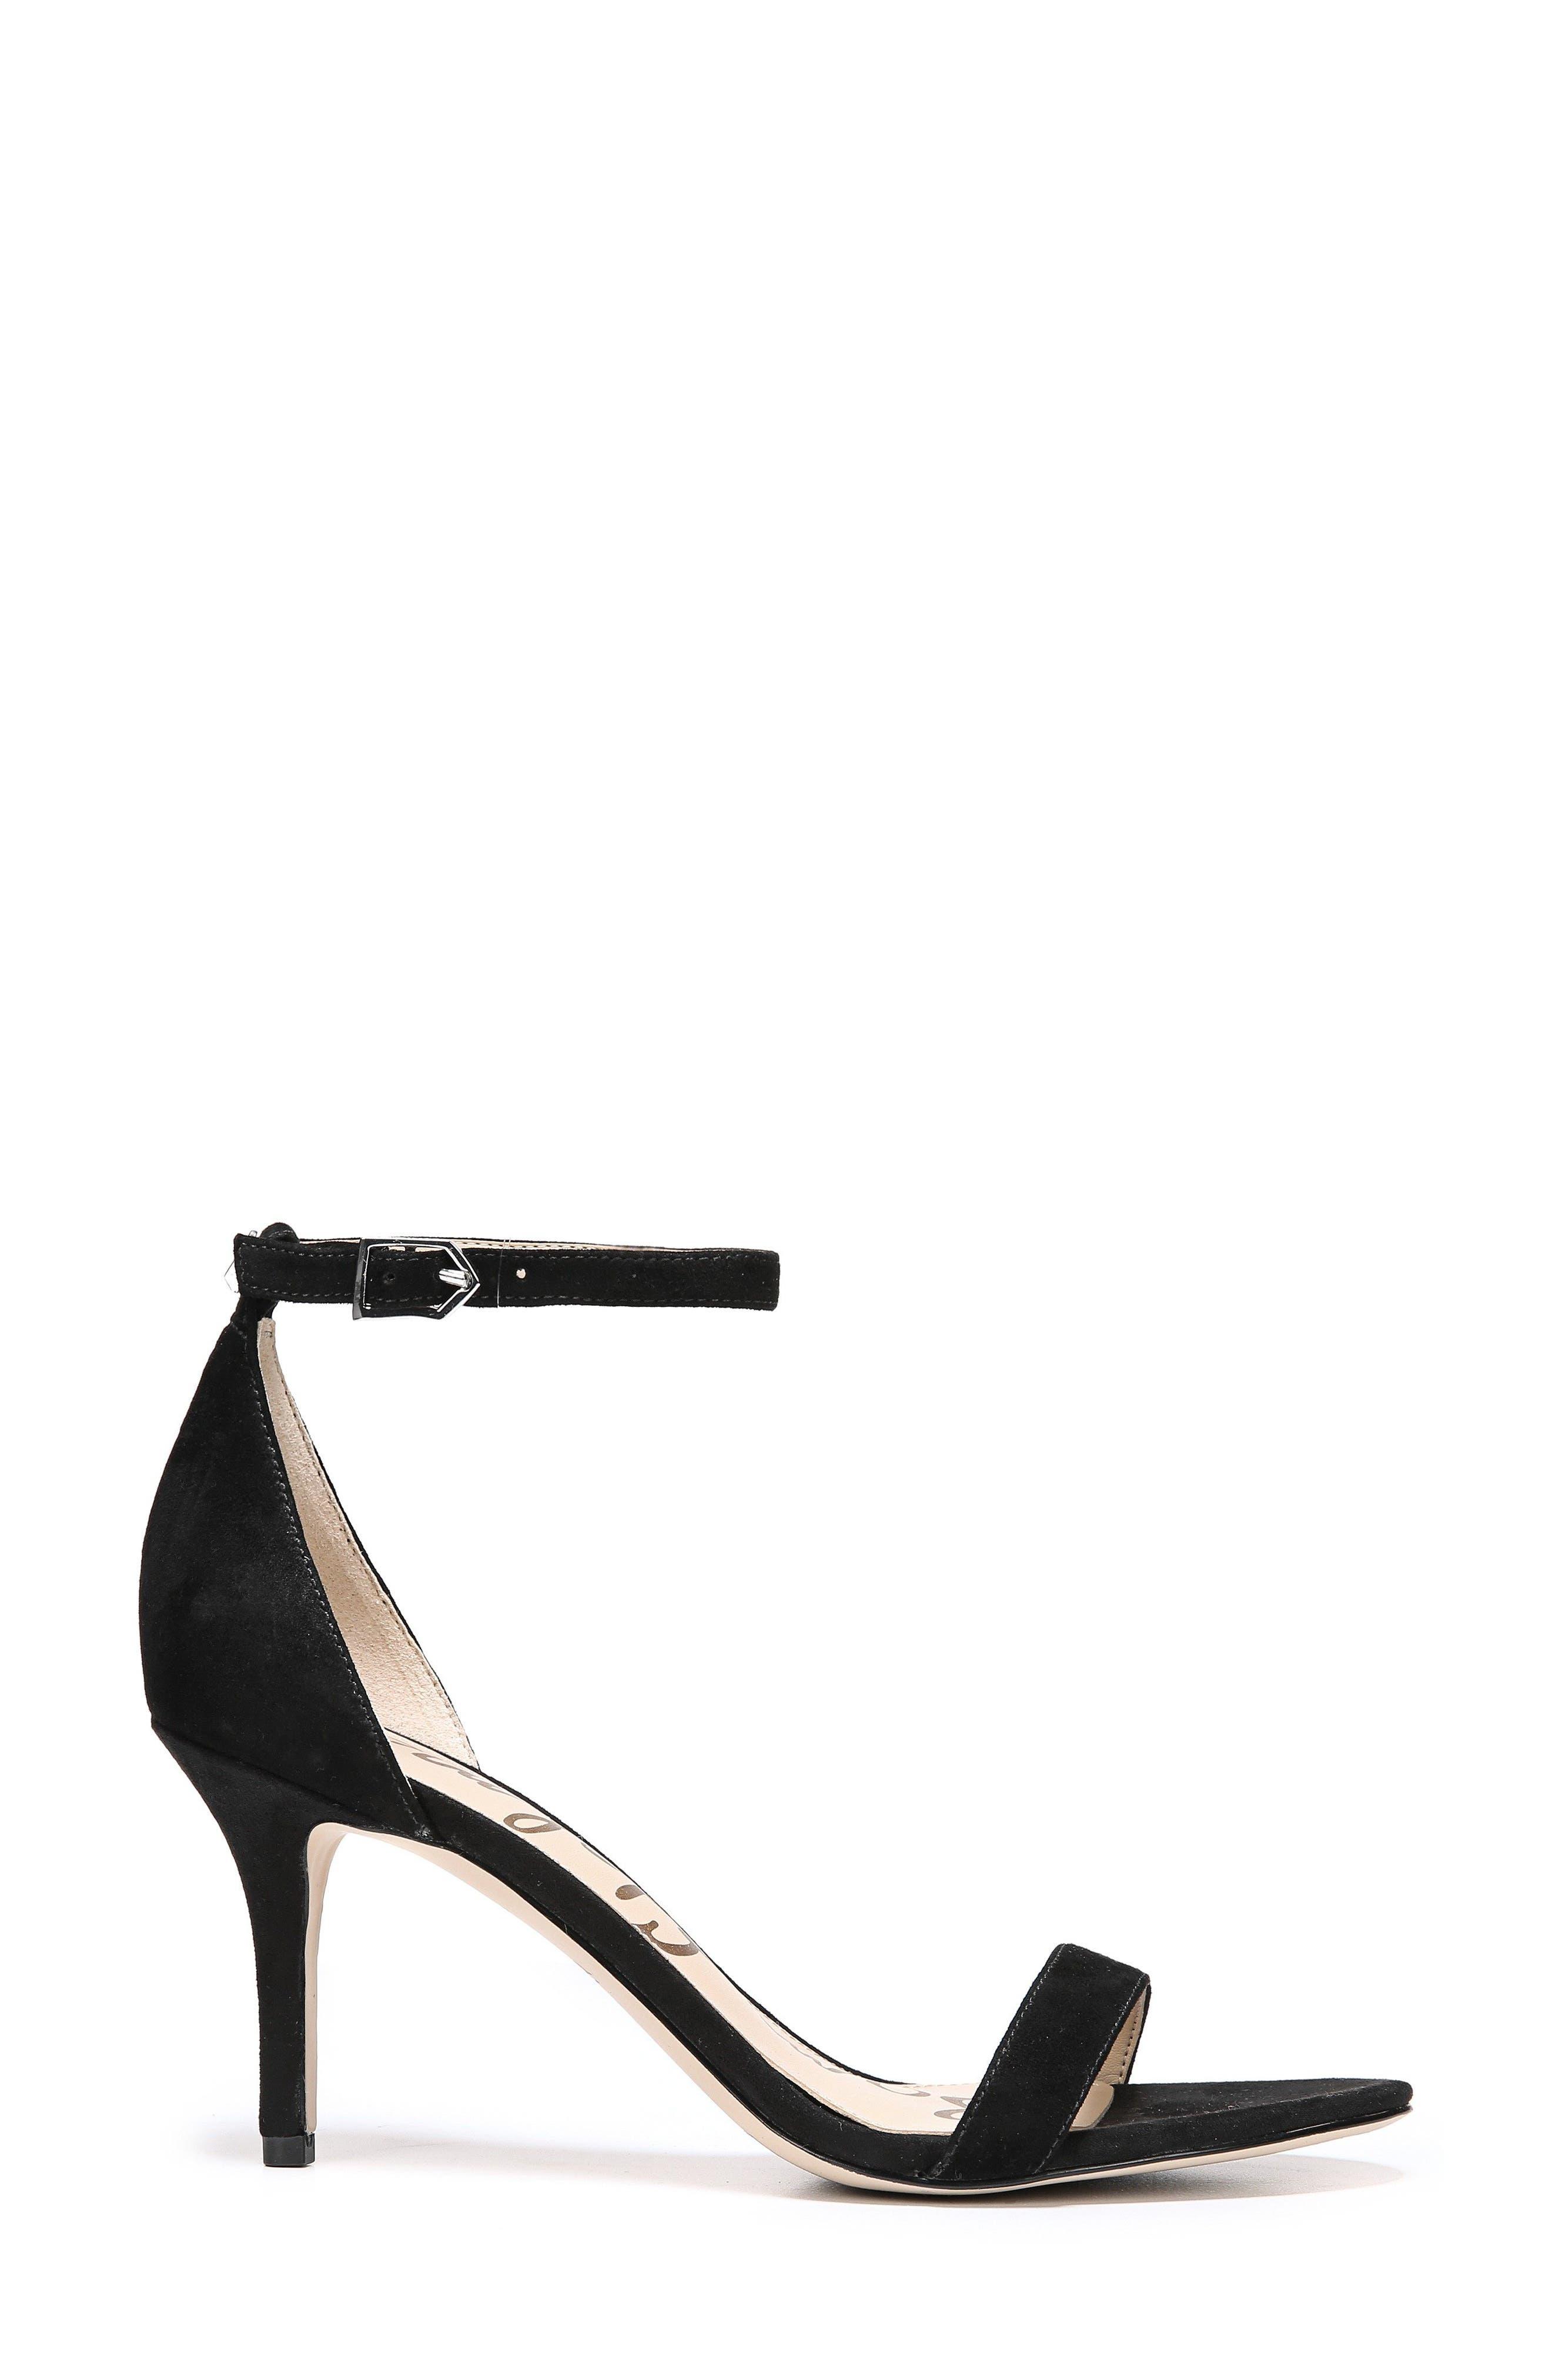 ,                             'Patti' Ankle Strap Sandal,                             Alternate thumbnail 152, color,                             005